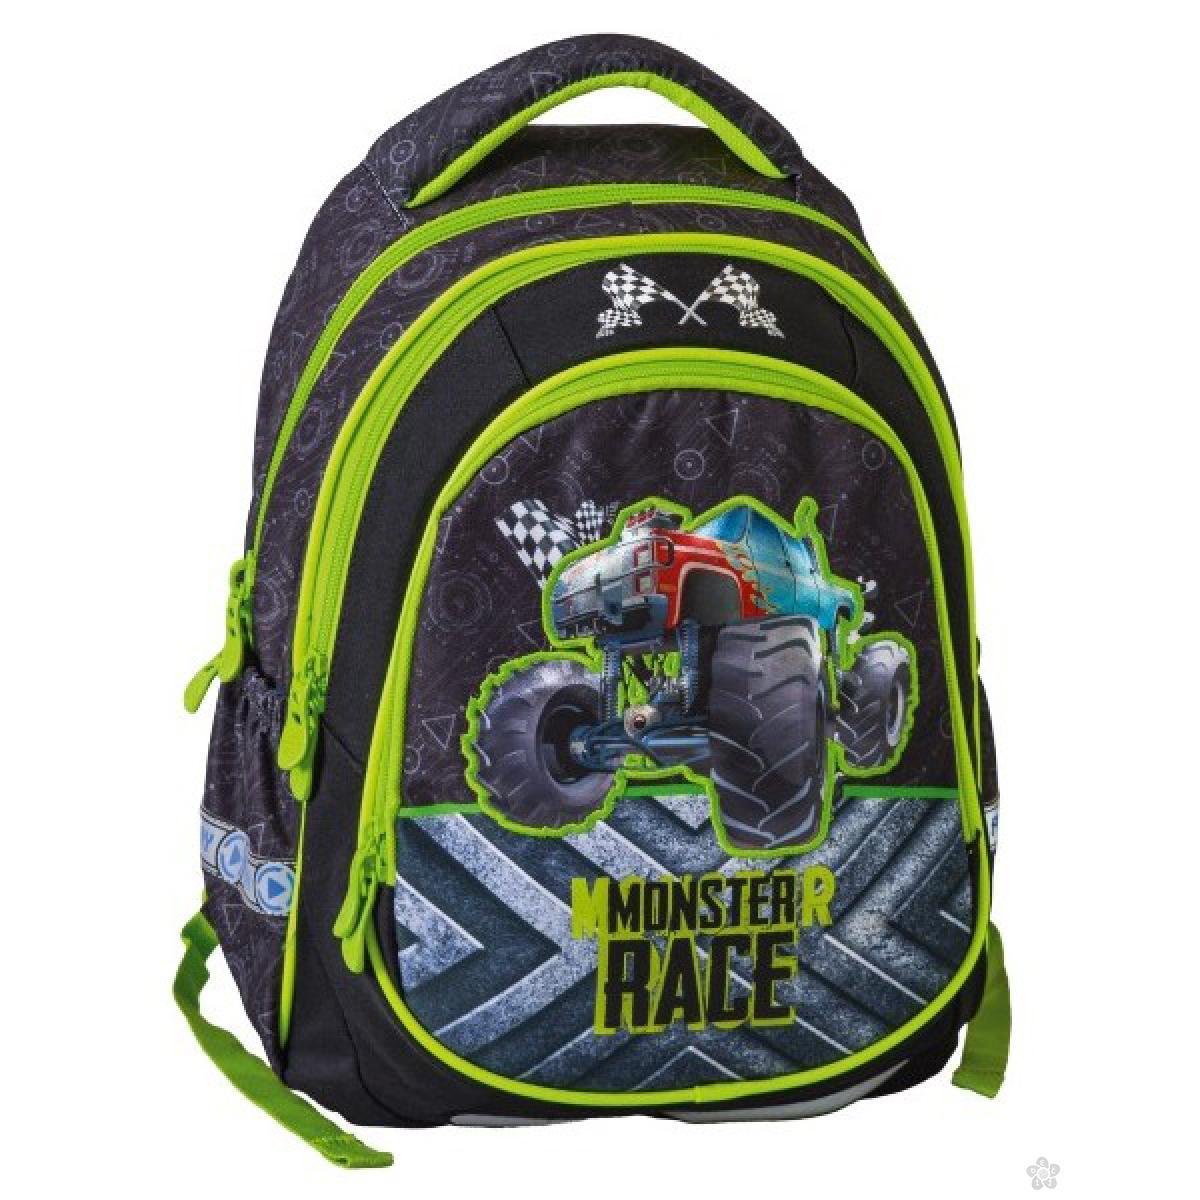 Anatomski ranac Maxx Monster Race 160820